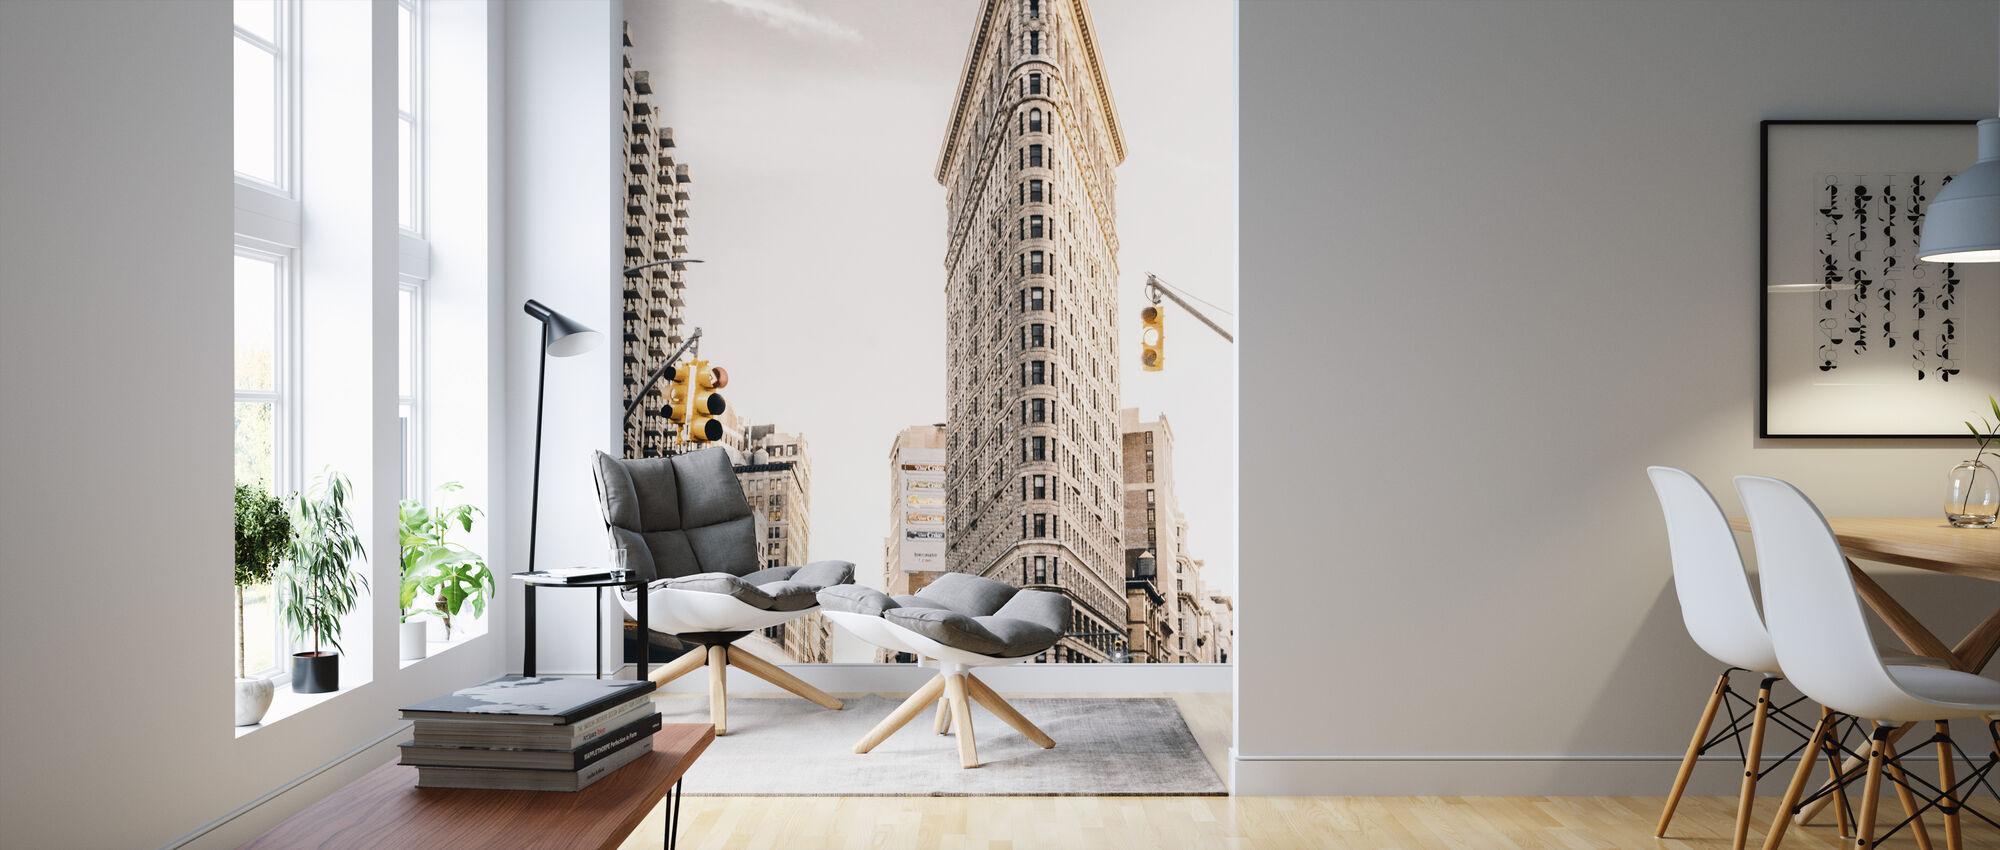 Flatiron District - Wallpaper - Living Room